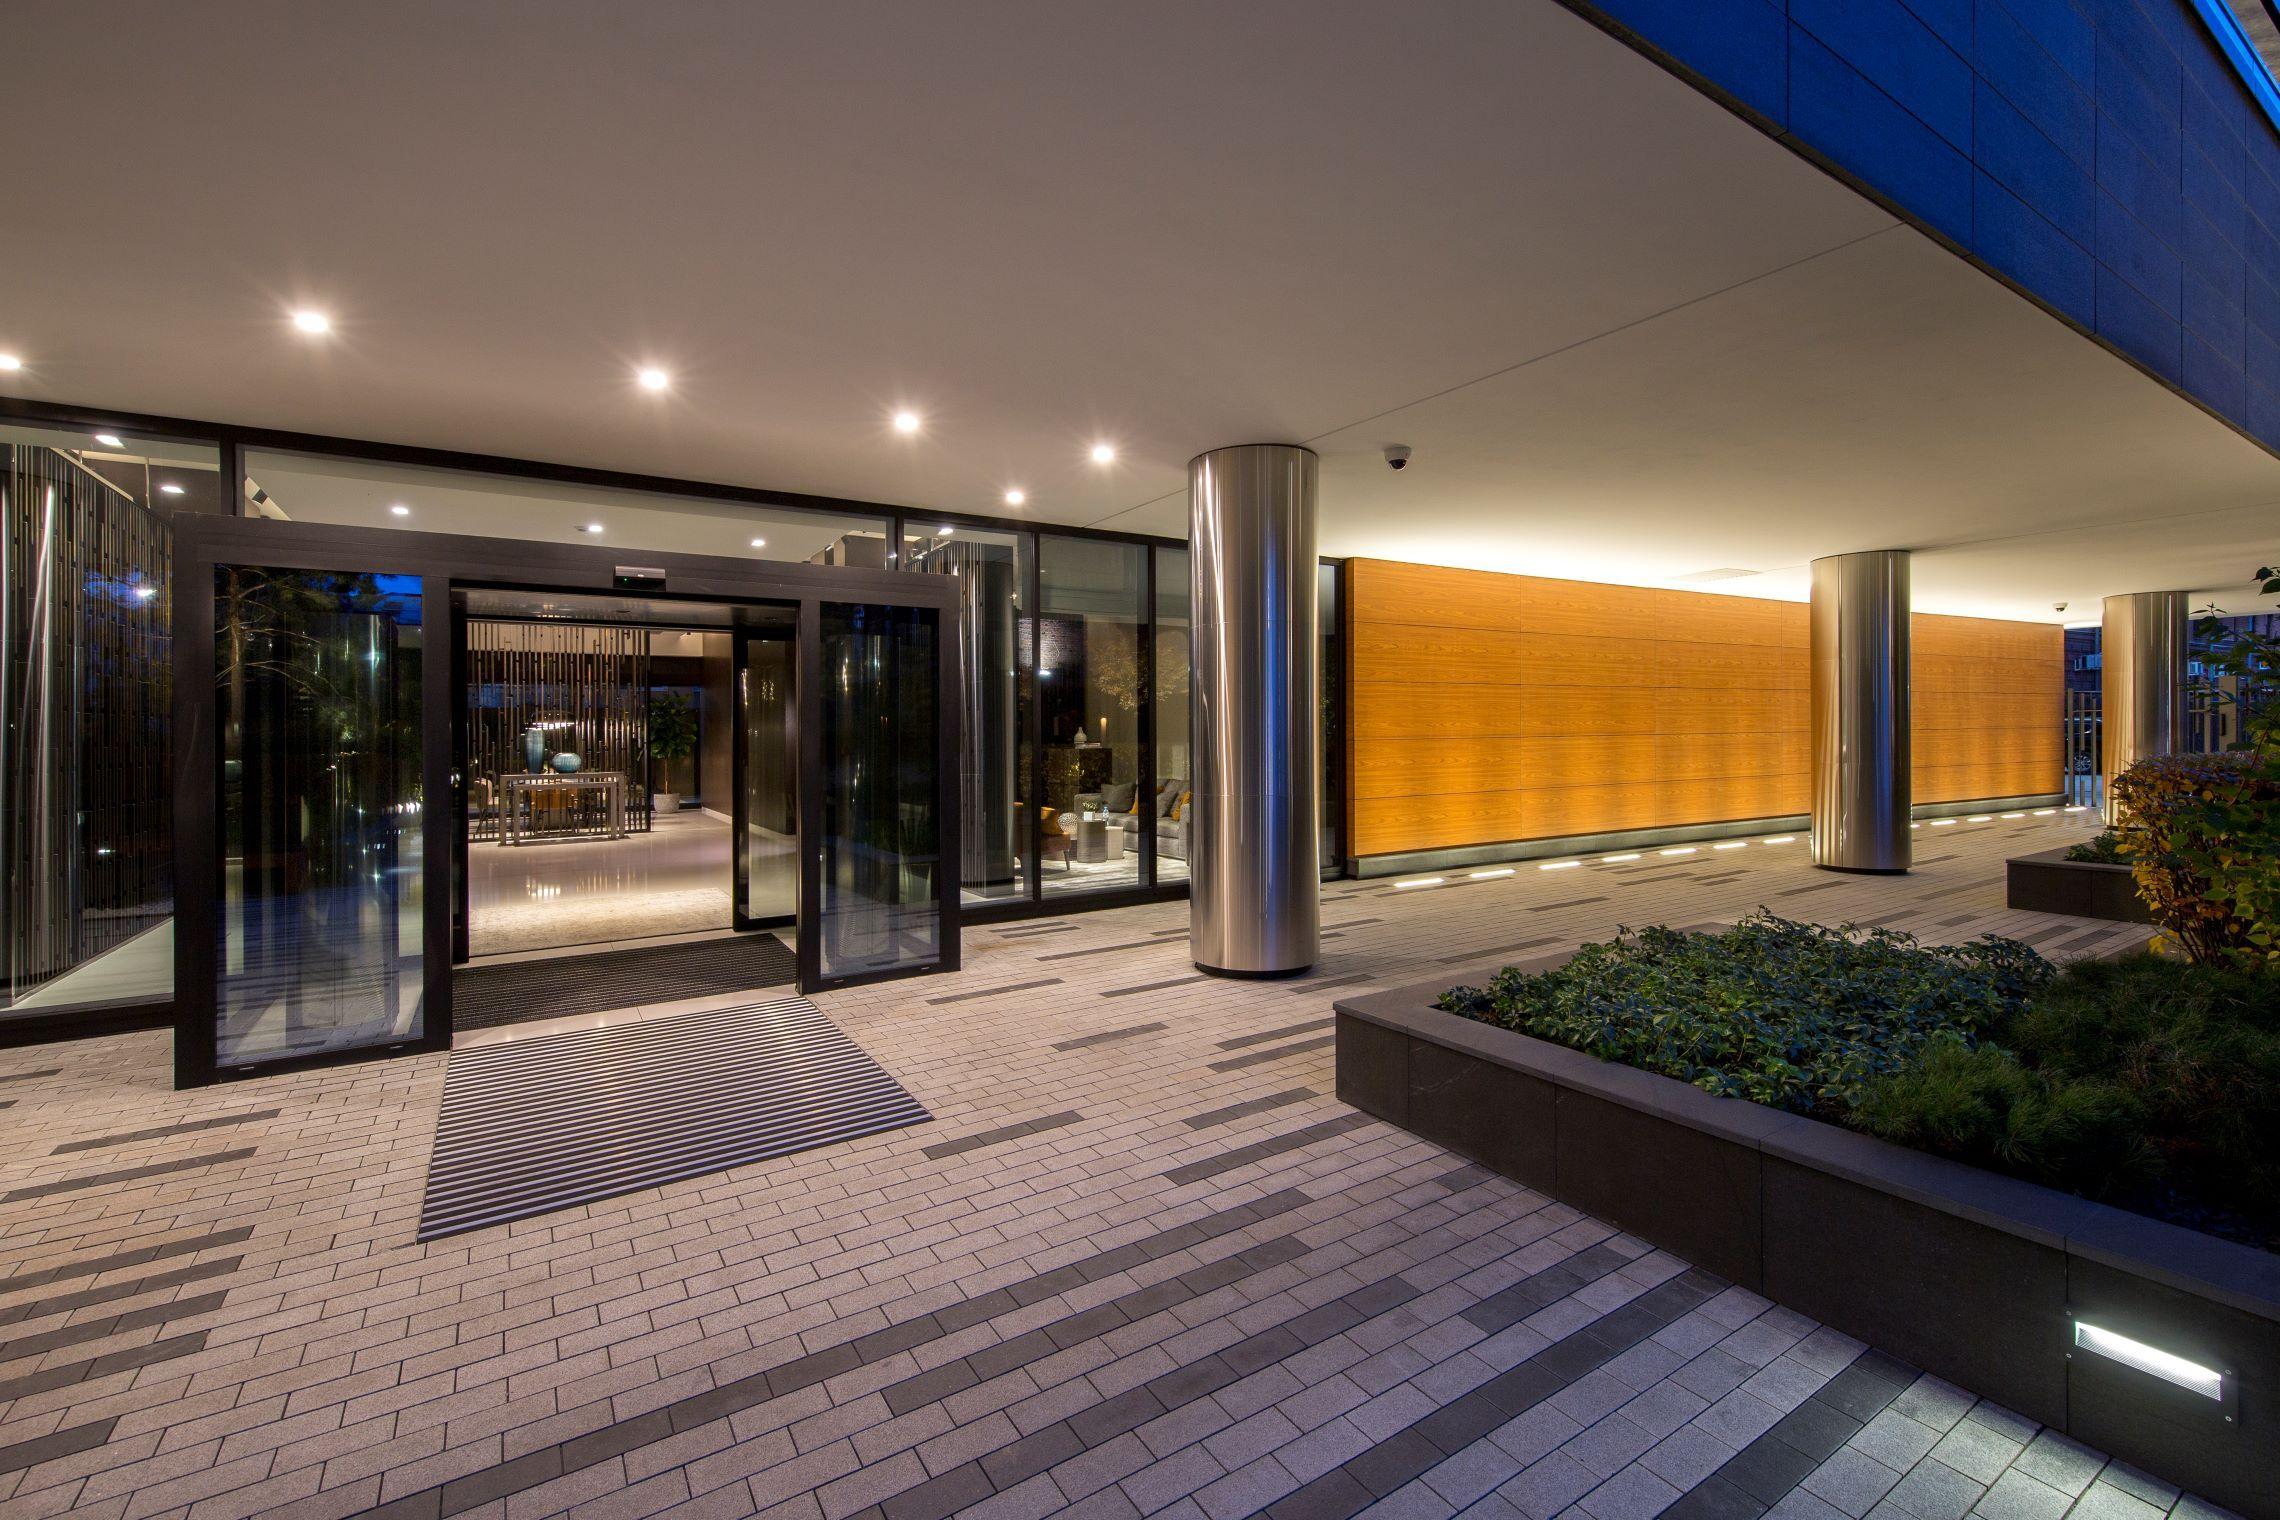 Entrance to Kandinsky House